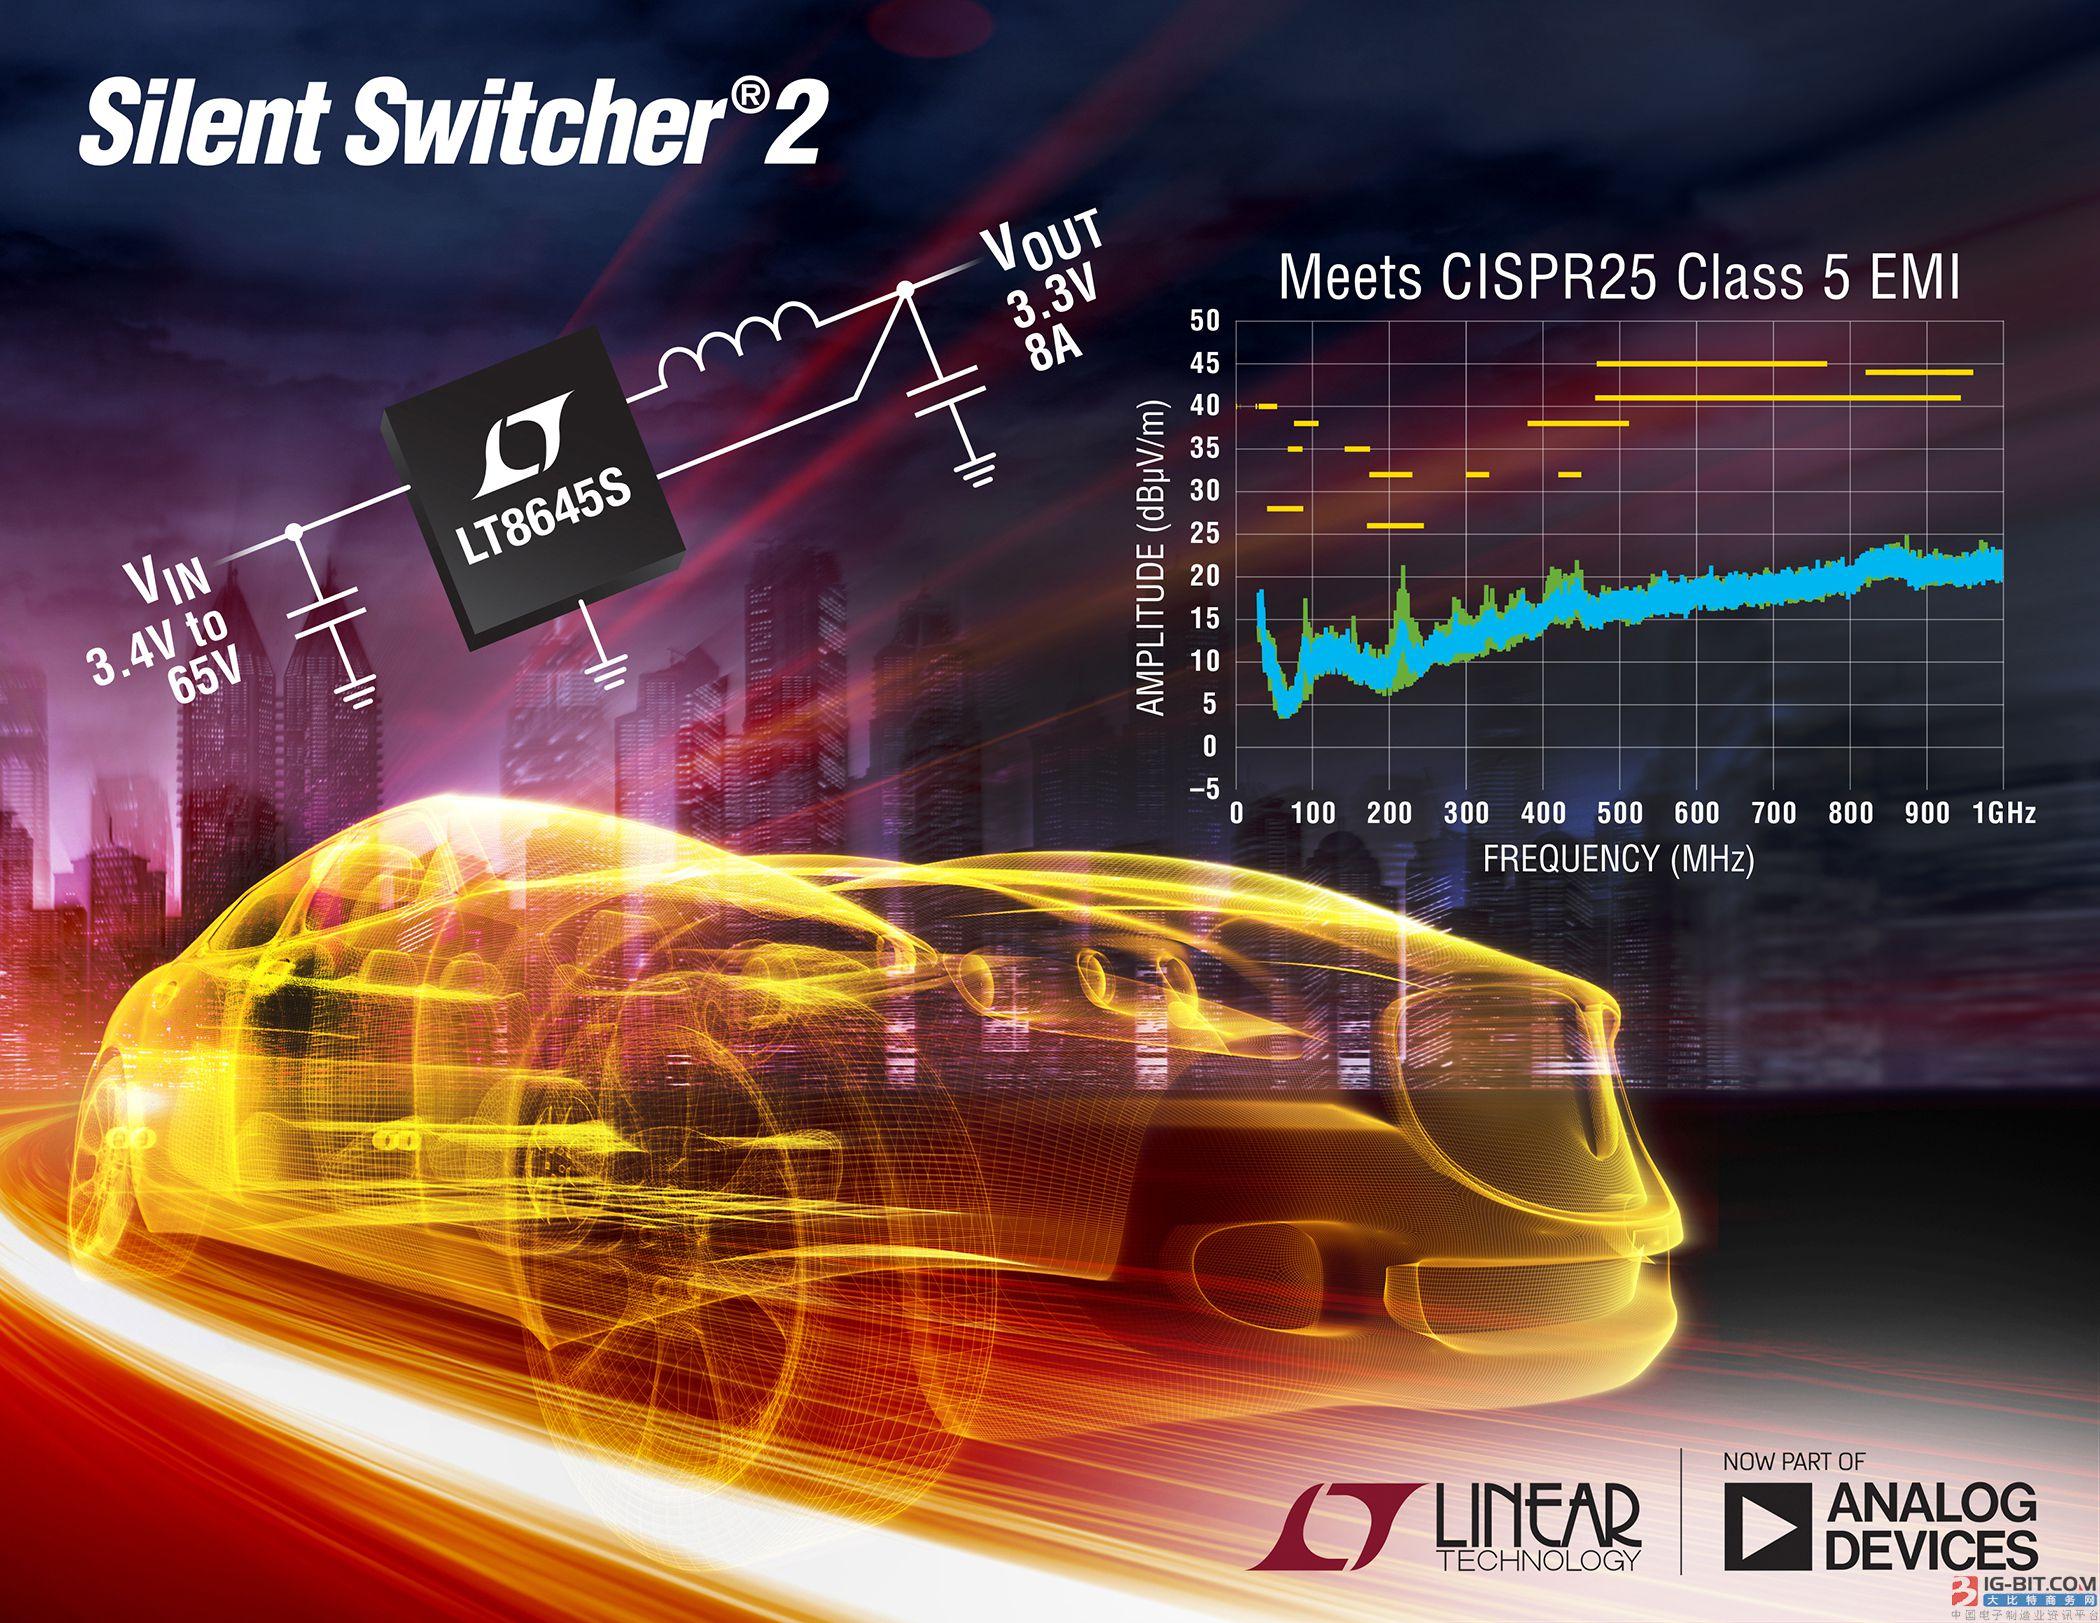 65V、8A (IOUT)、同步降压型Silent Switcher 2 在 2MHz 提供 94% 效率并具超低 EMI / EMC 辐射